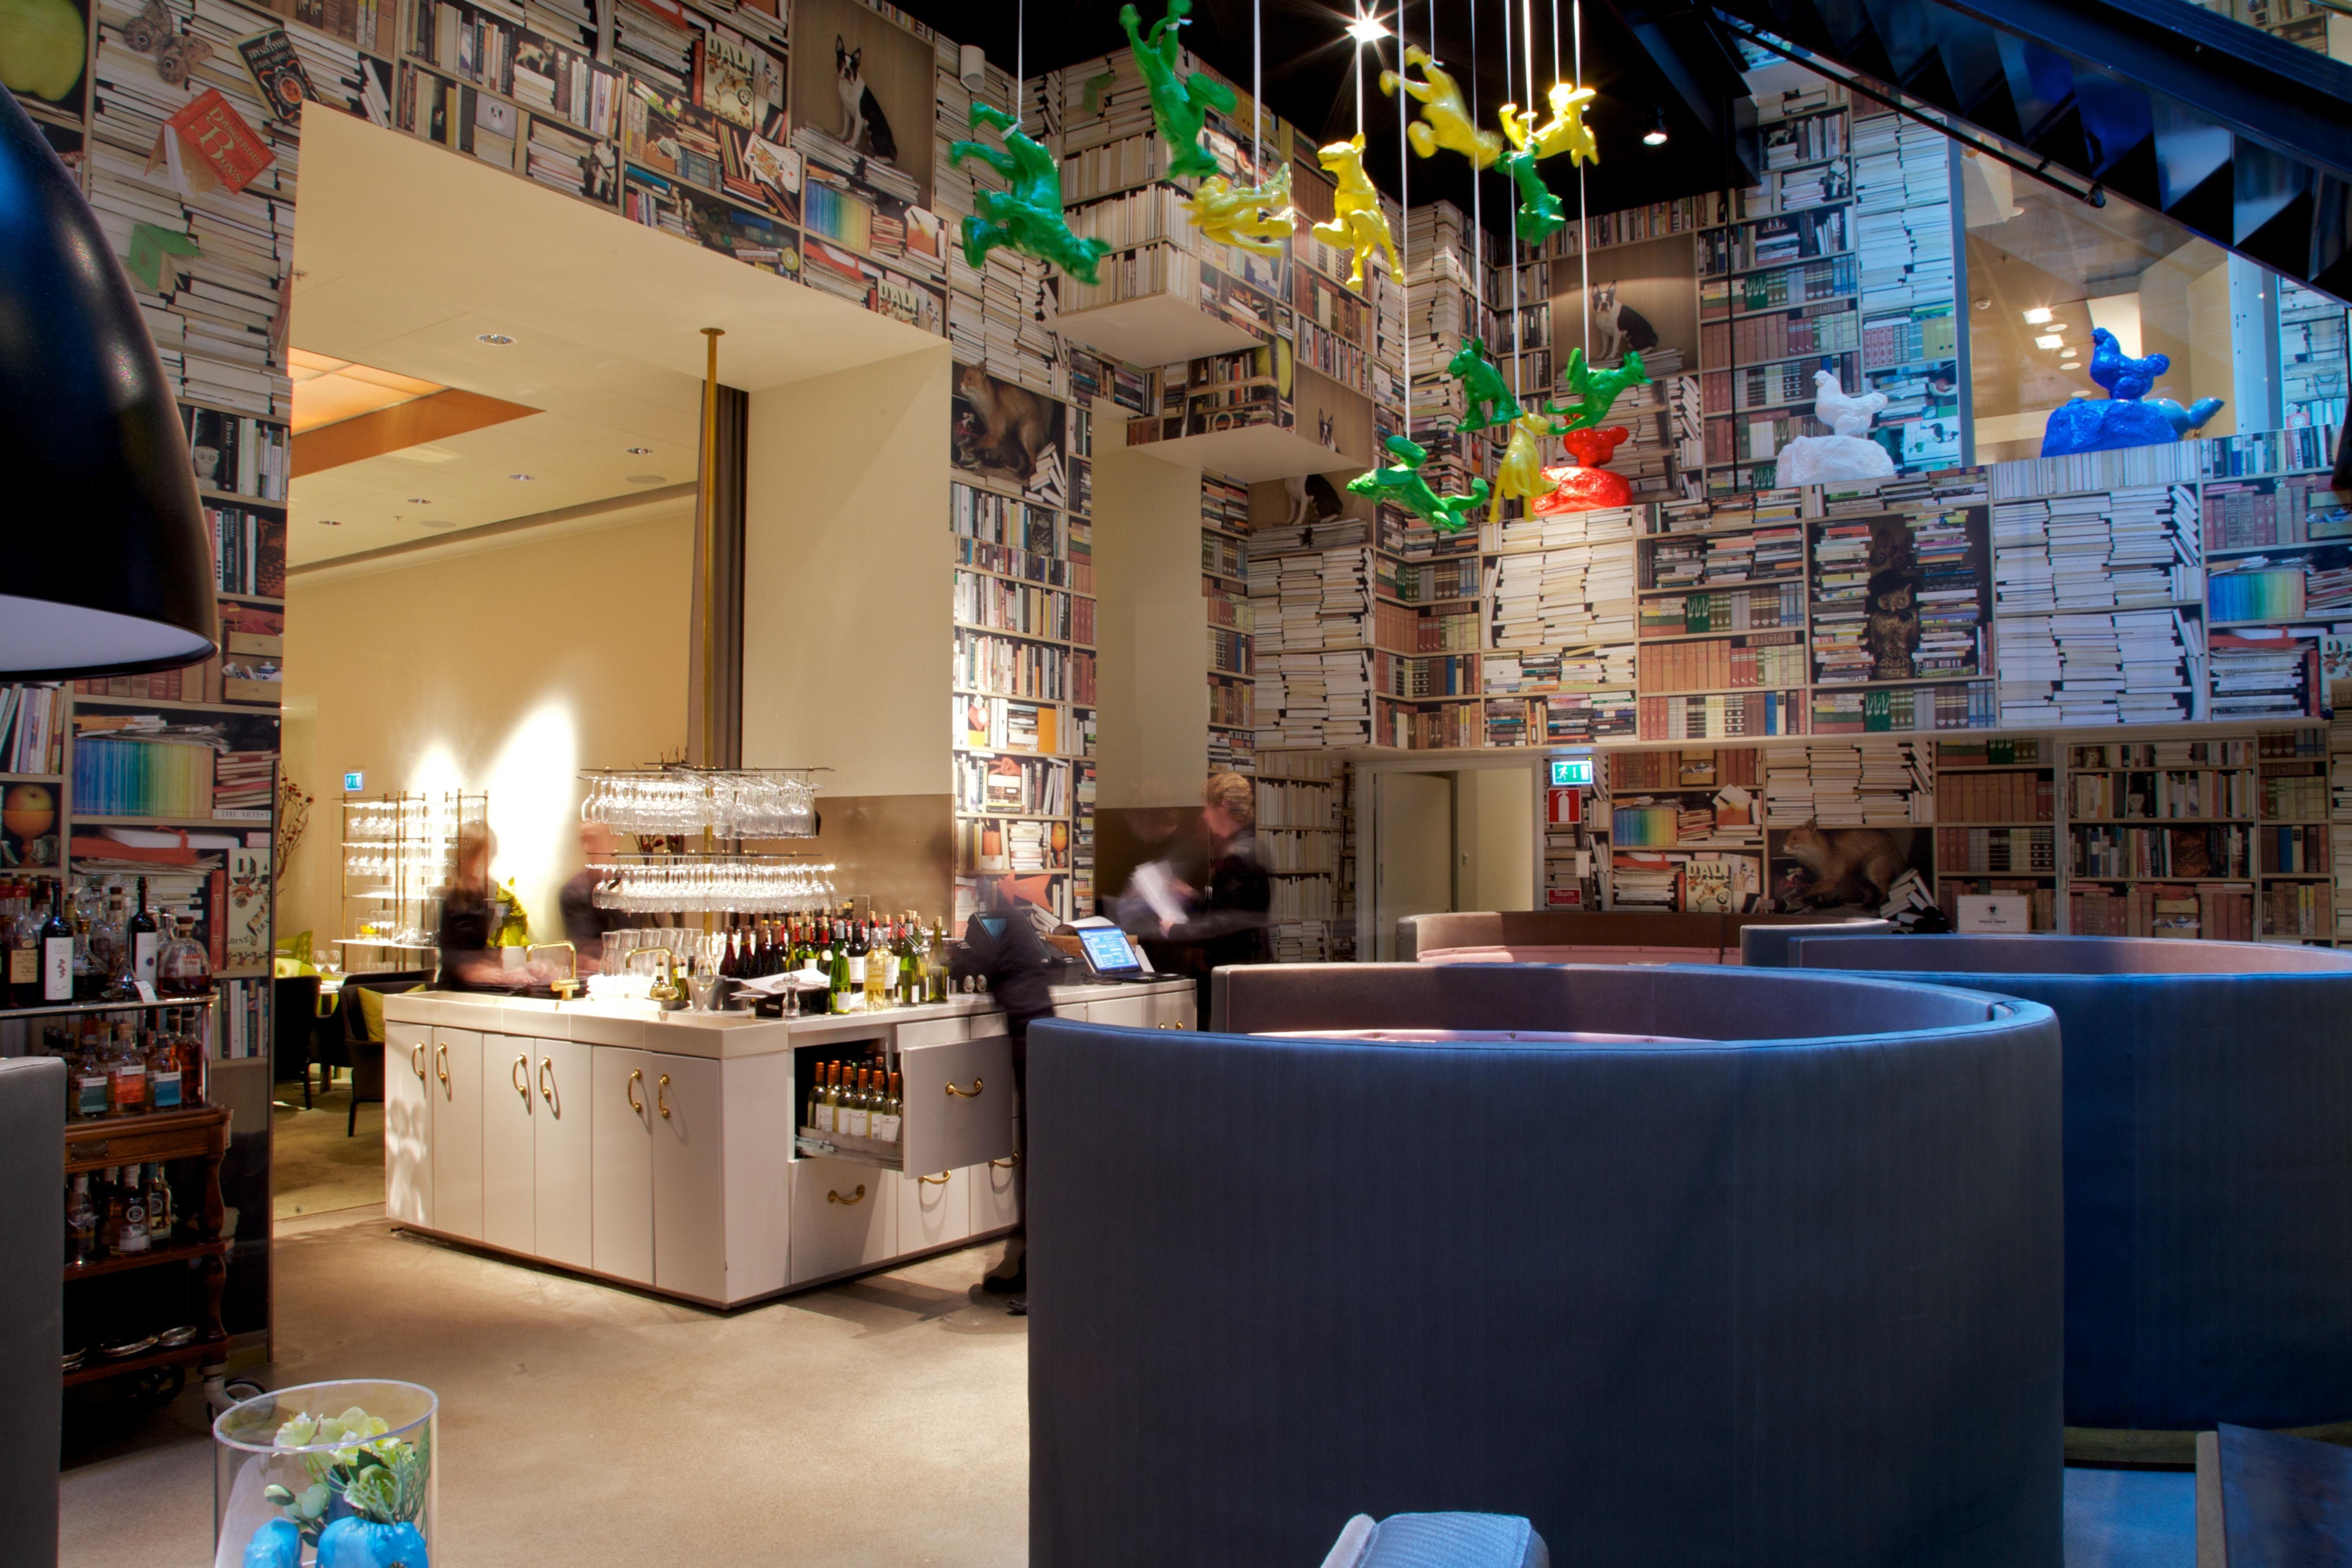 design pinterest stockholm google. Pontus Stockholm - Google Search Design Pinterest A